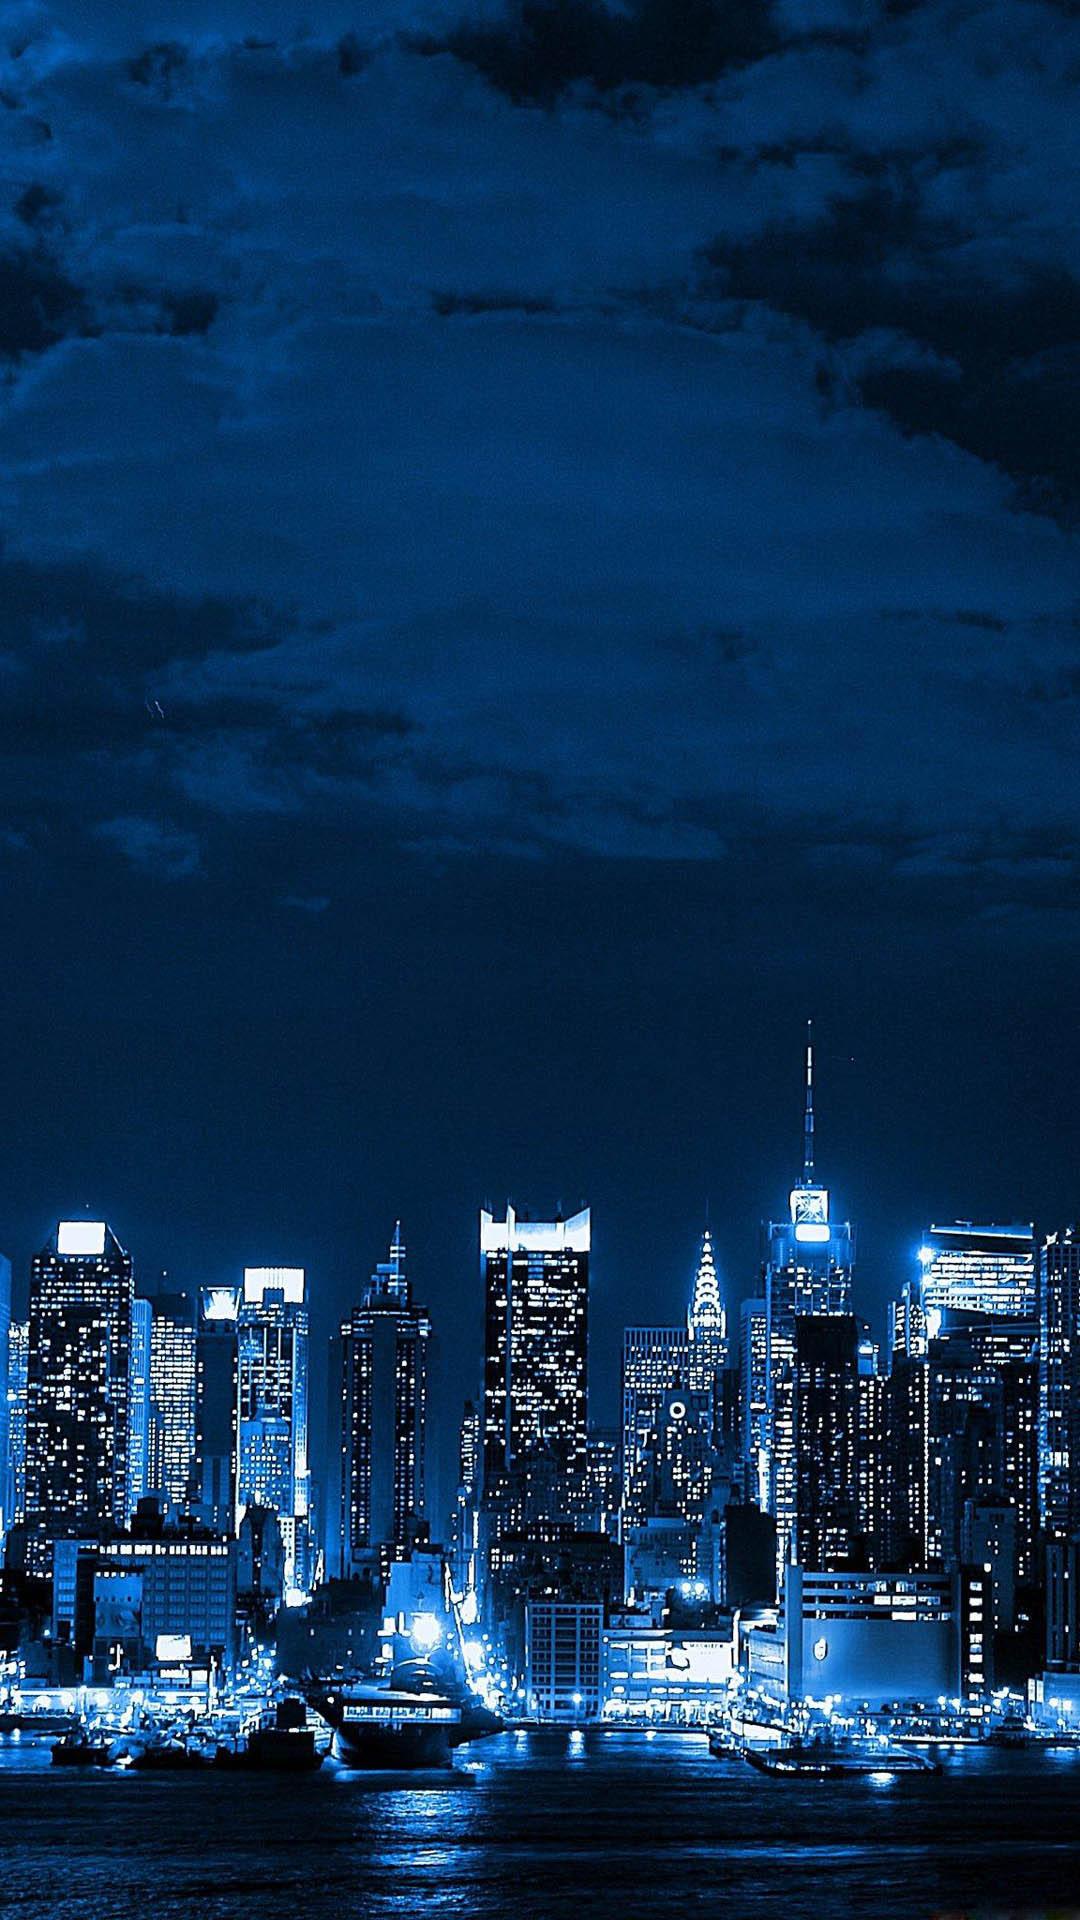 Metropolis Big City Night Skyline Best htc one wallpapers